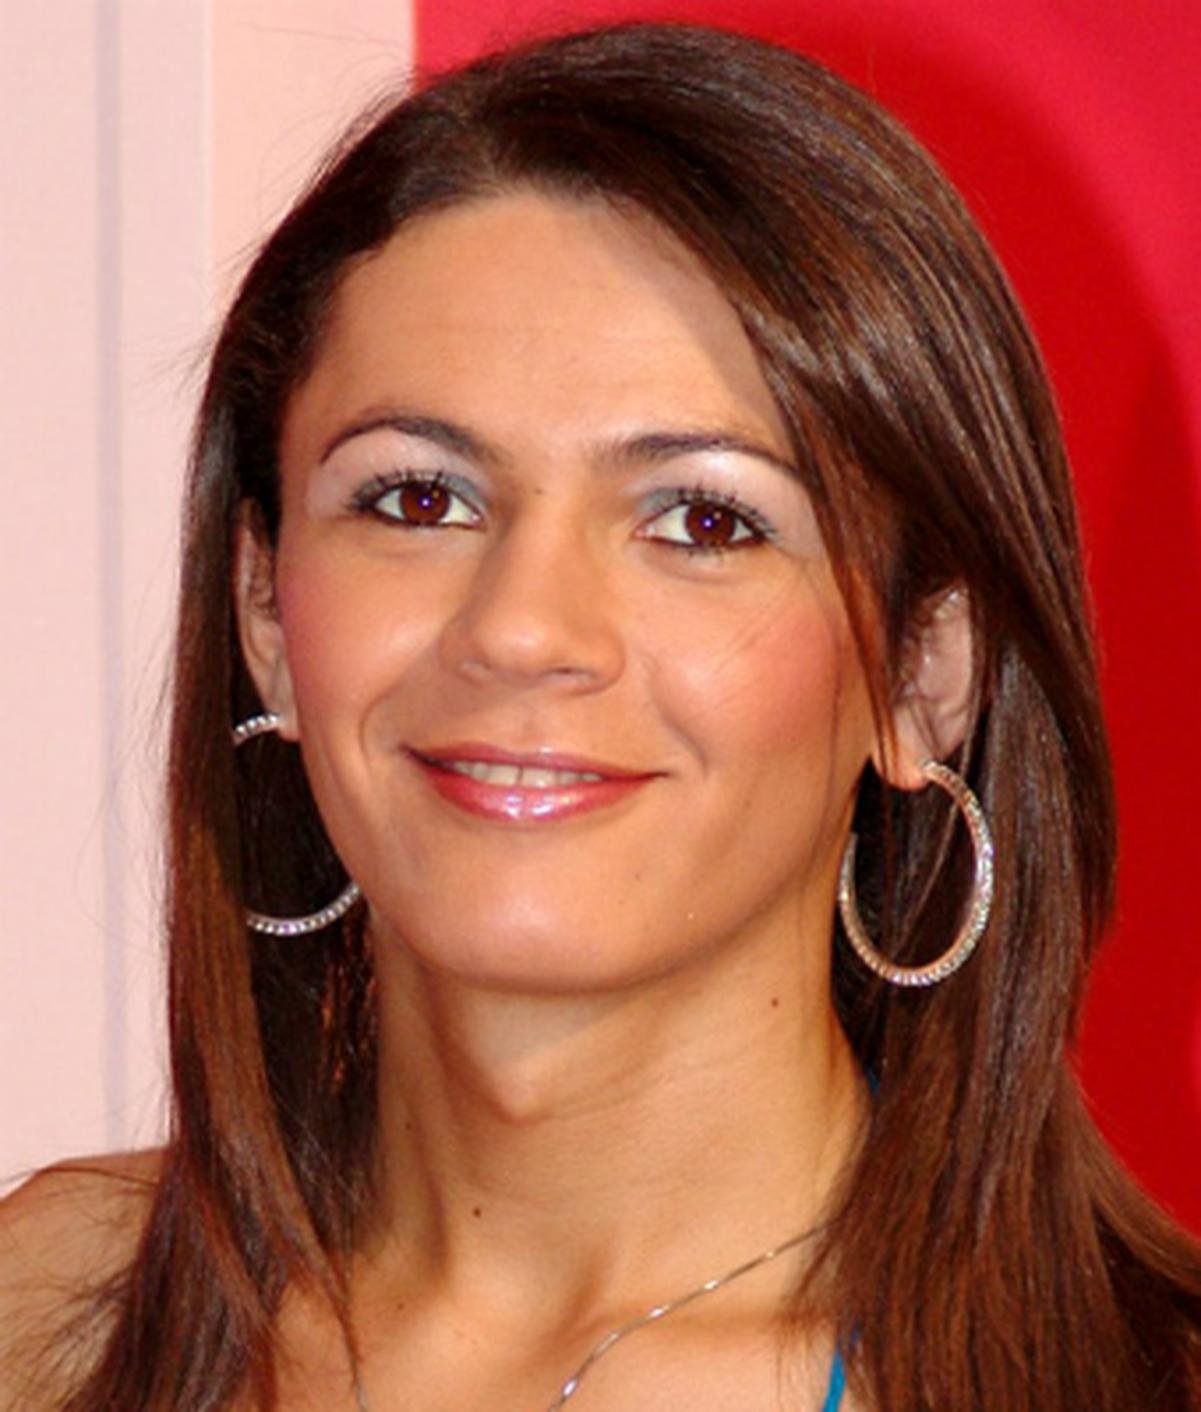 Brazilian Shemale Kelly Ohana